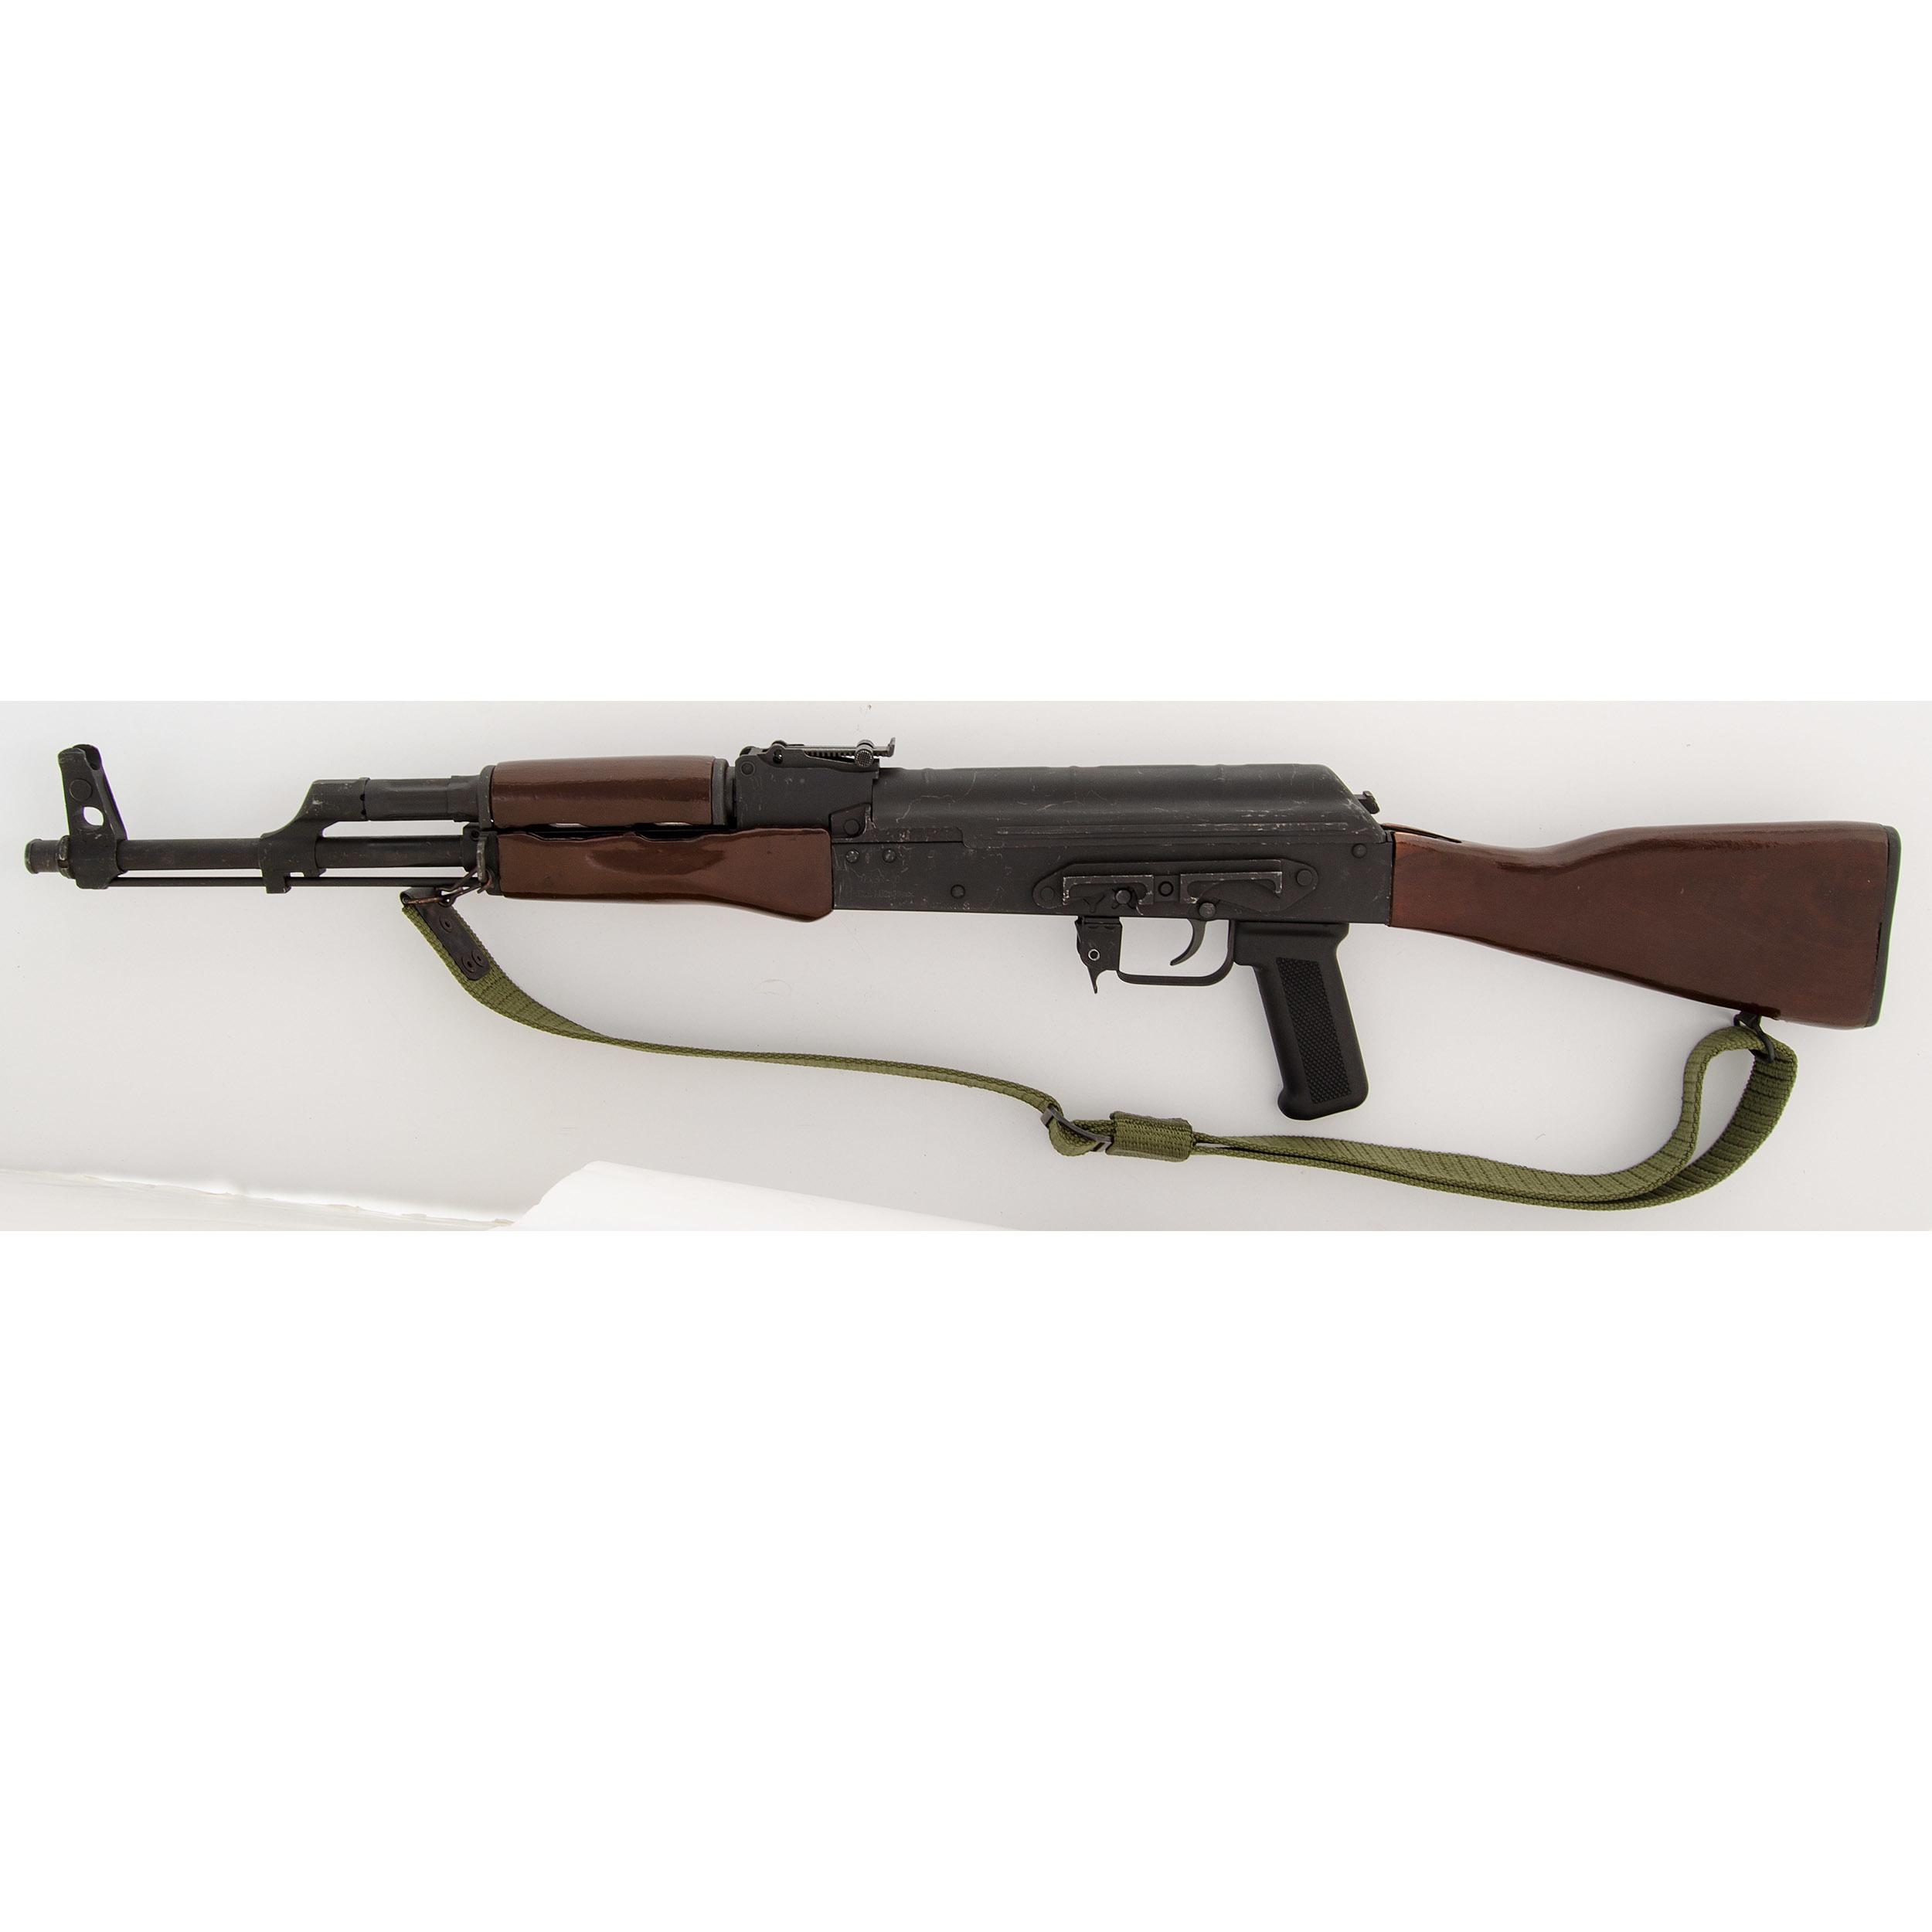 Romanian WASR-10 Semi-Automatic Rifle   Cowan's Auction House: The